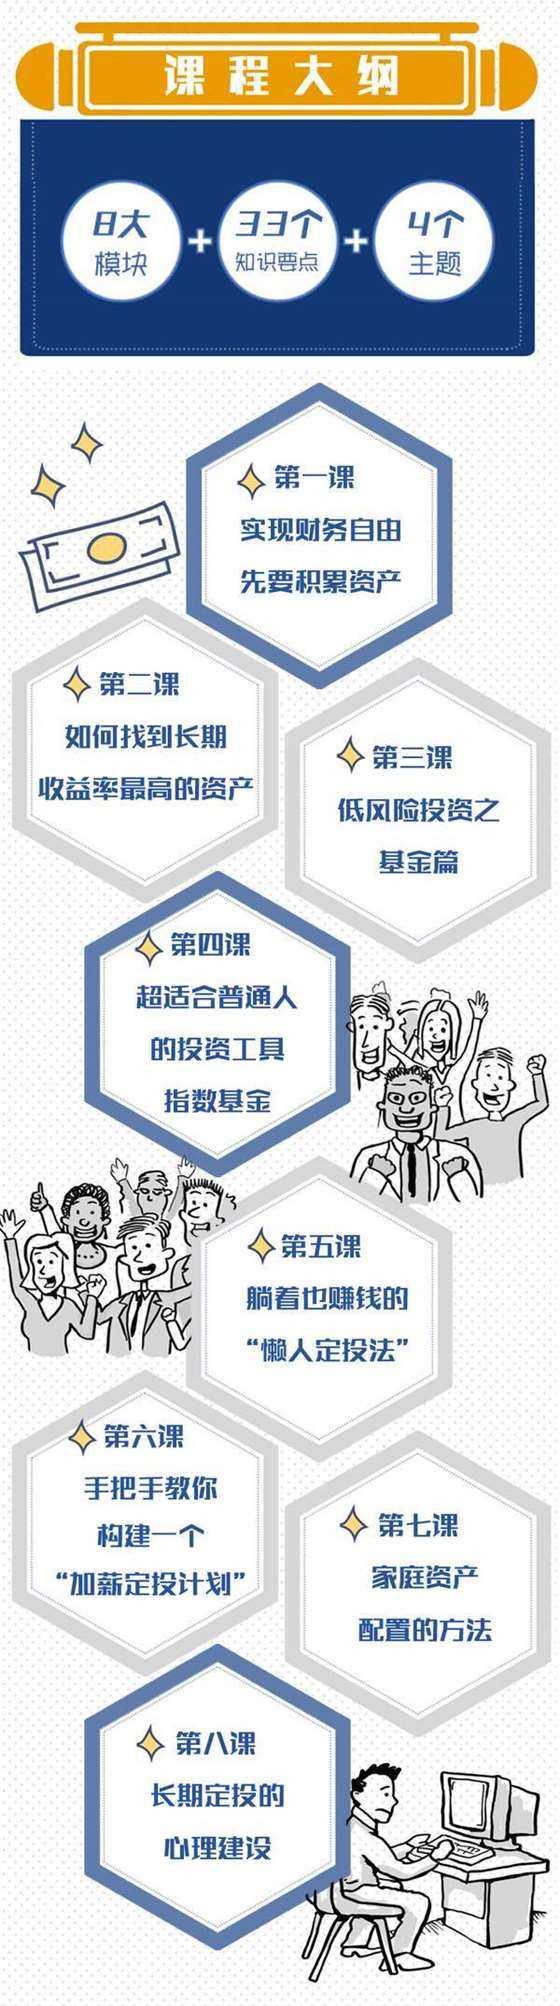 http://www.huodongxing.com/file/20160530/5092341960349/713175109076955.jpeg